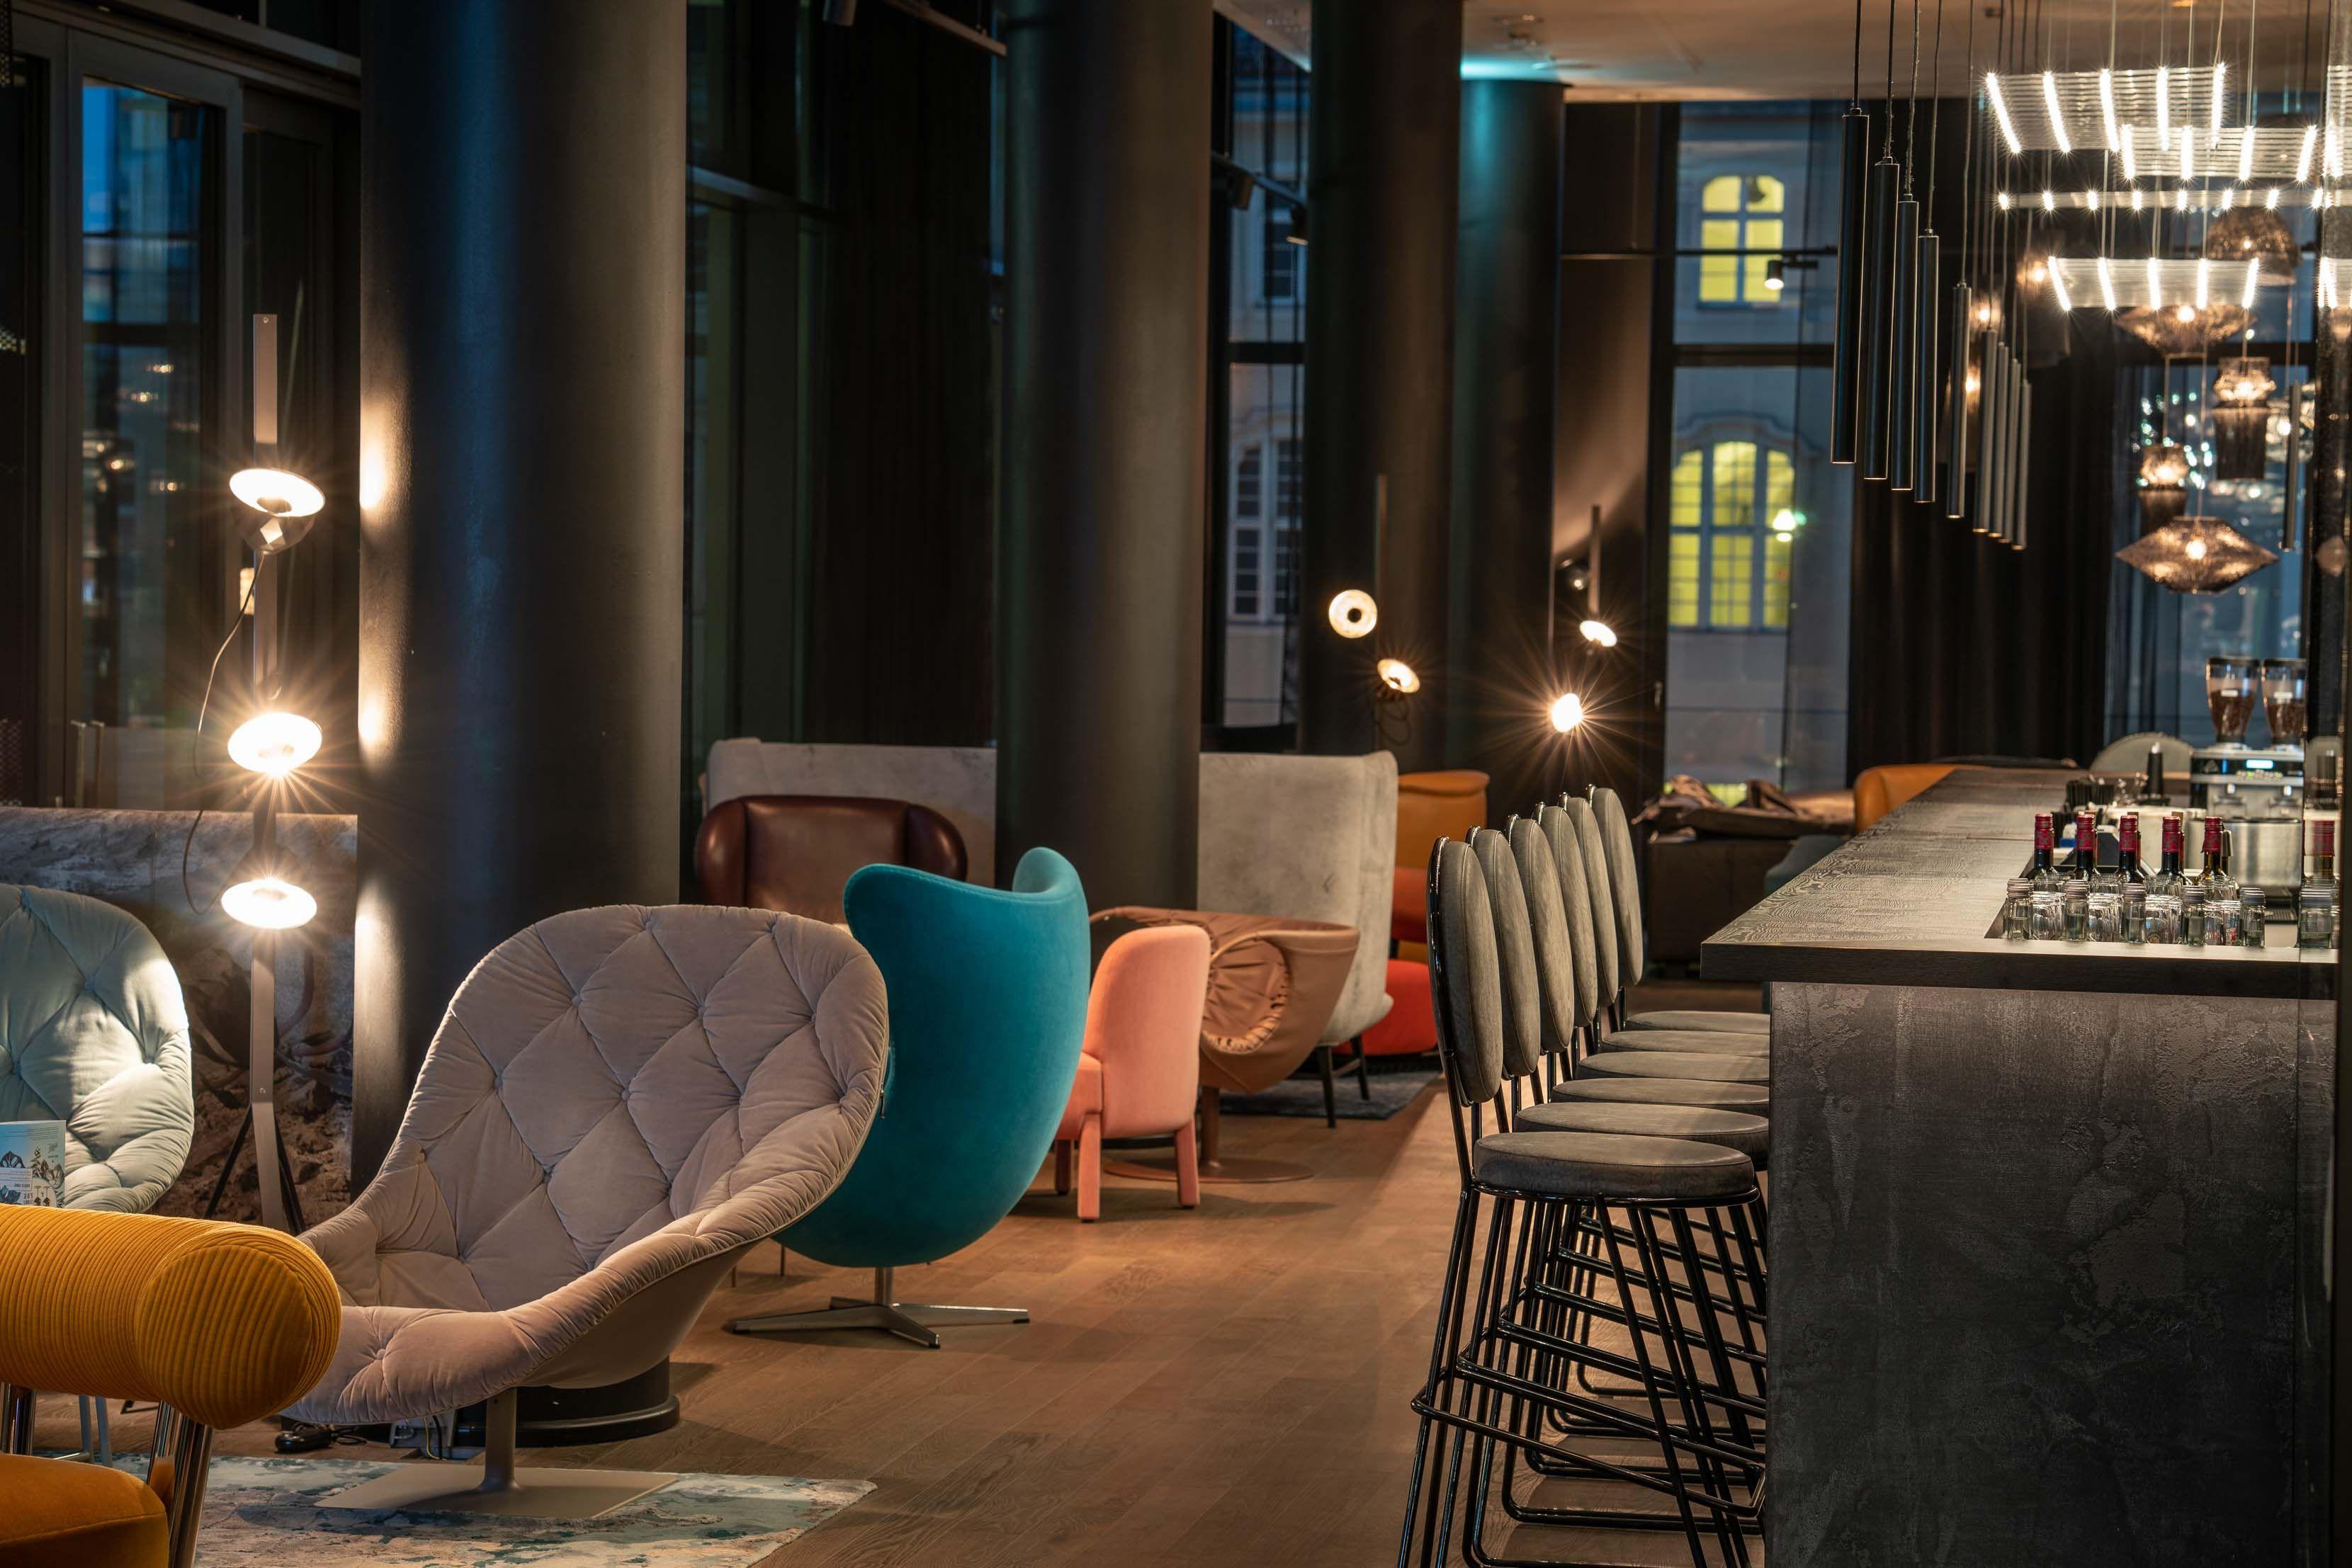 Hotel Berlin Alexanderplatz Motel One Design Hotels Berlin Alexanderplatz Hotels Design Design Hotel